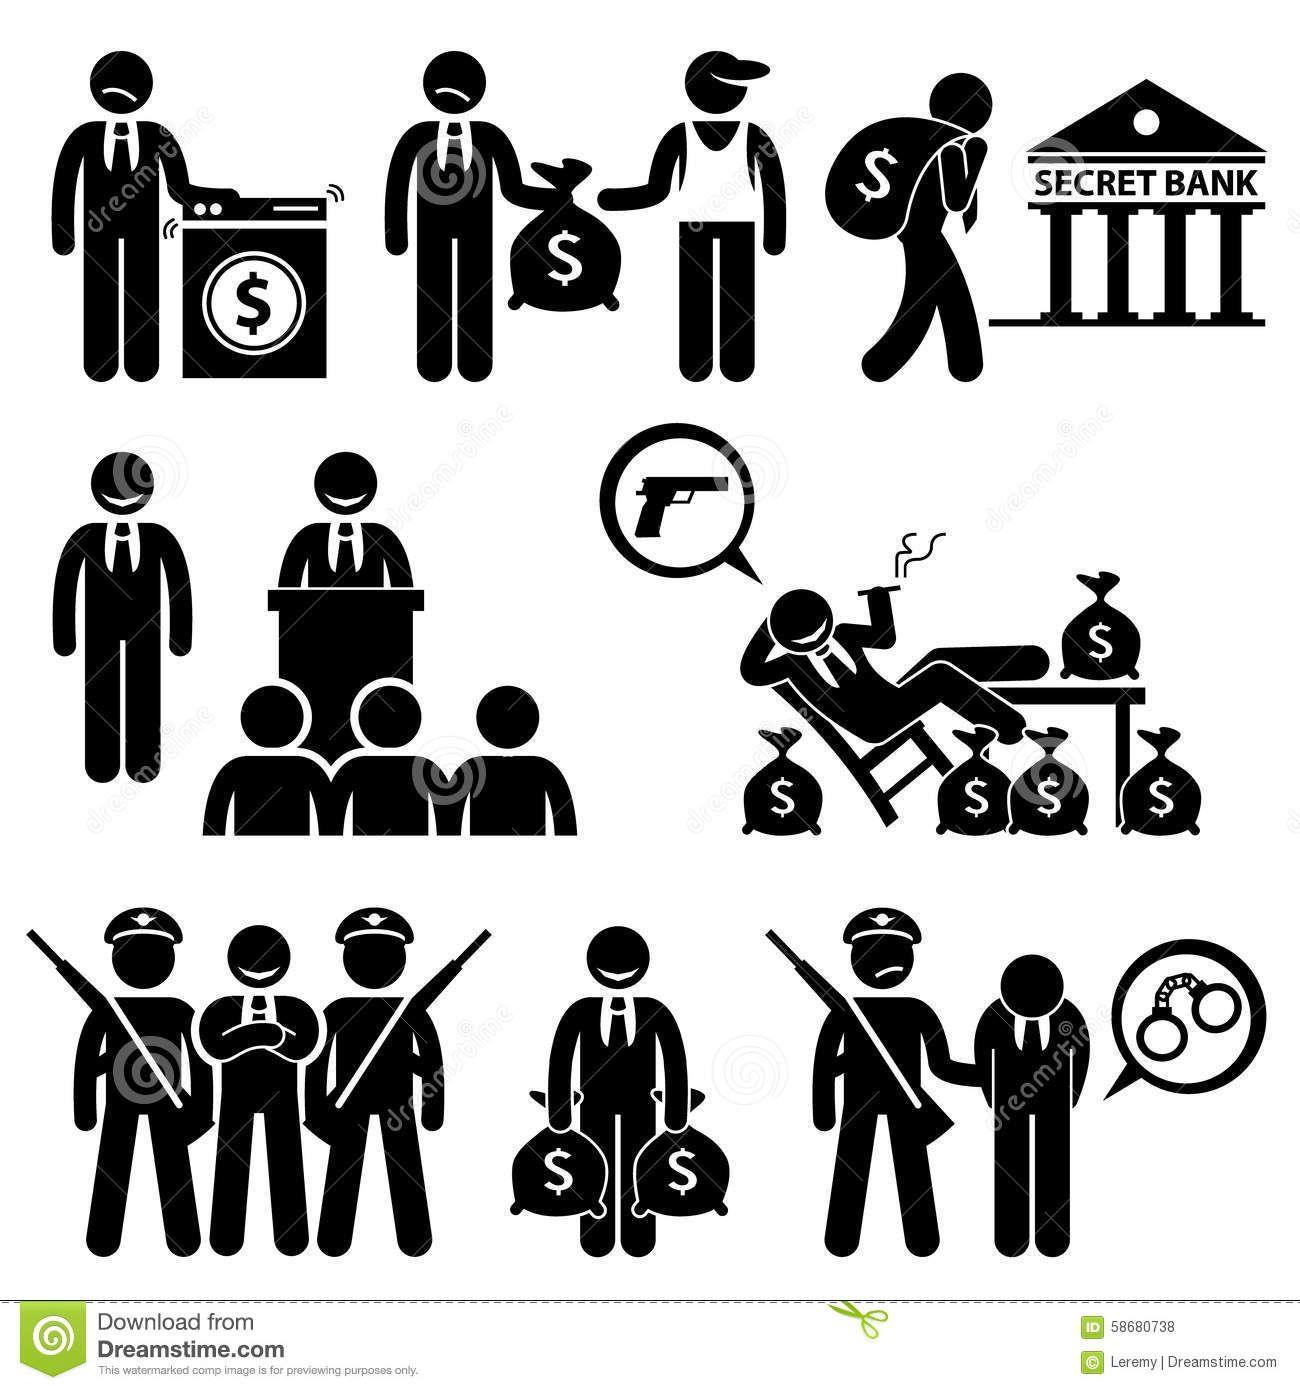 Criminal clipart criminal activity. Pin on assortment of